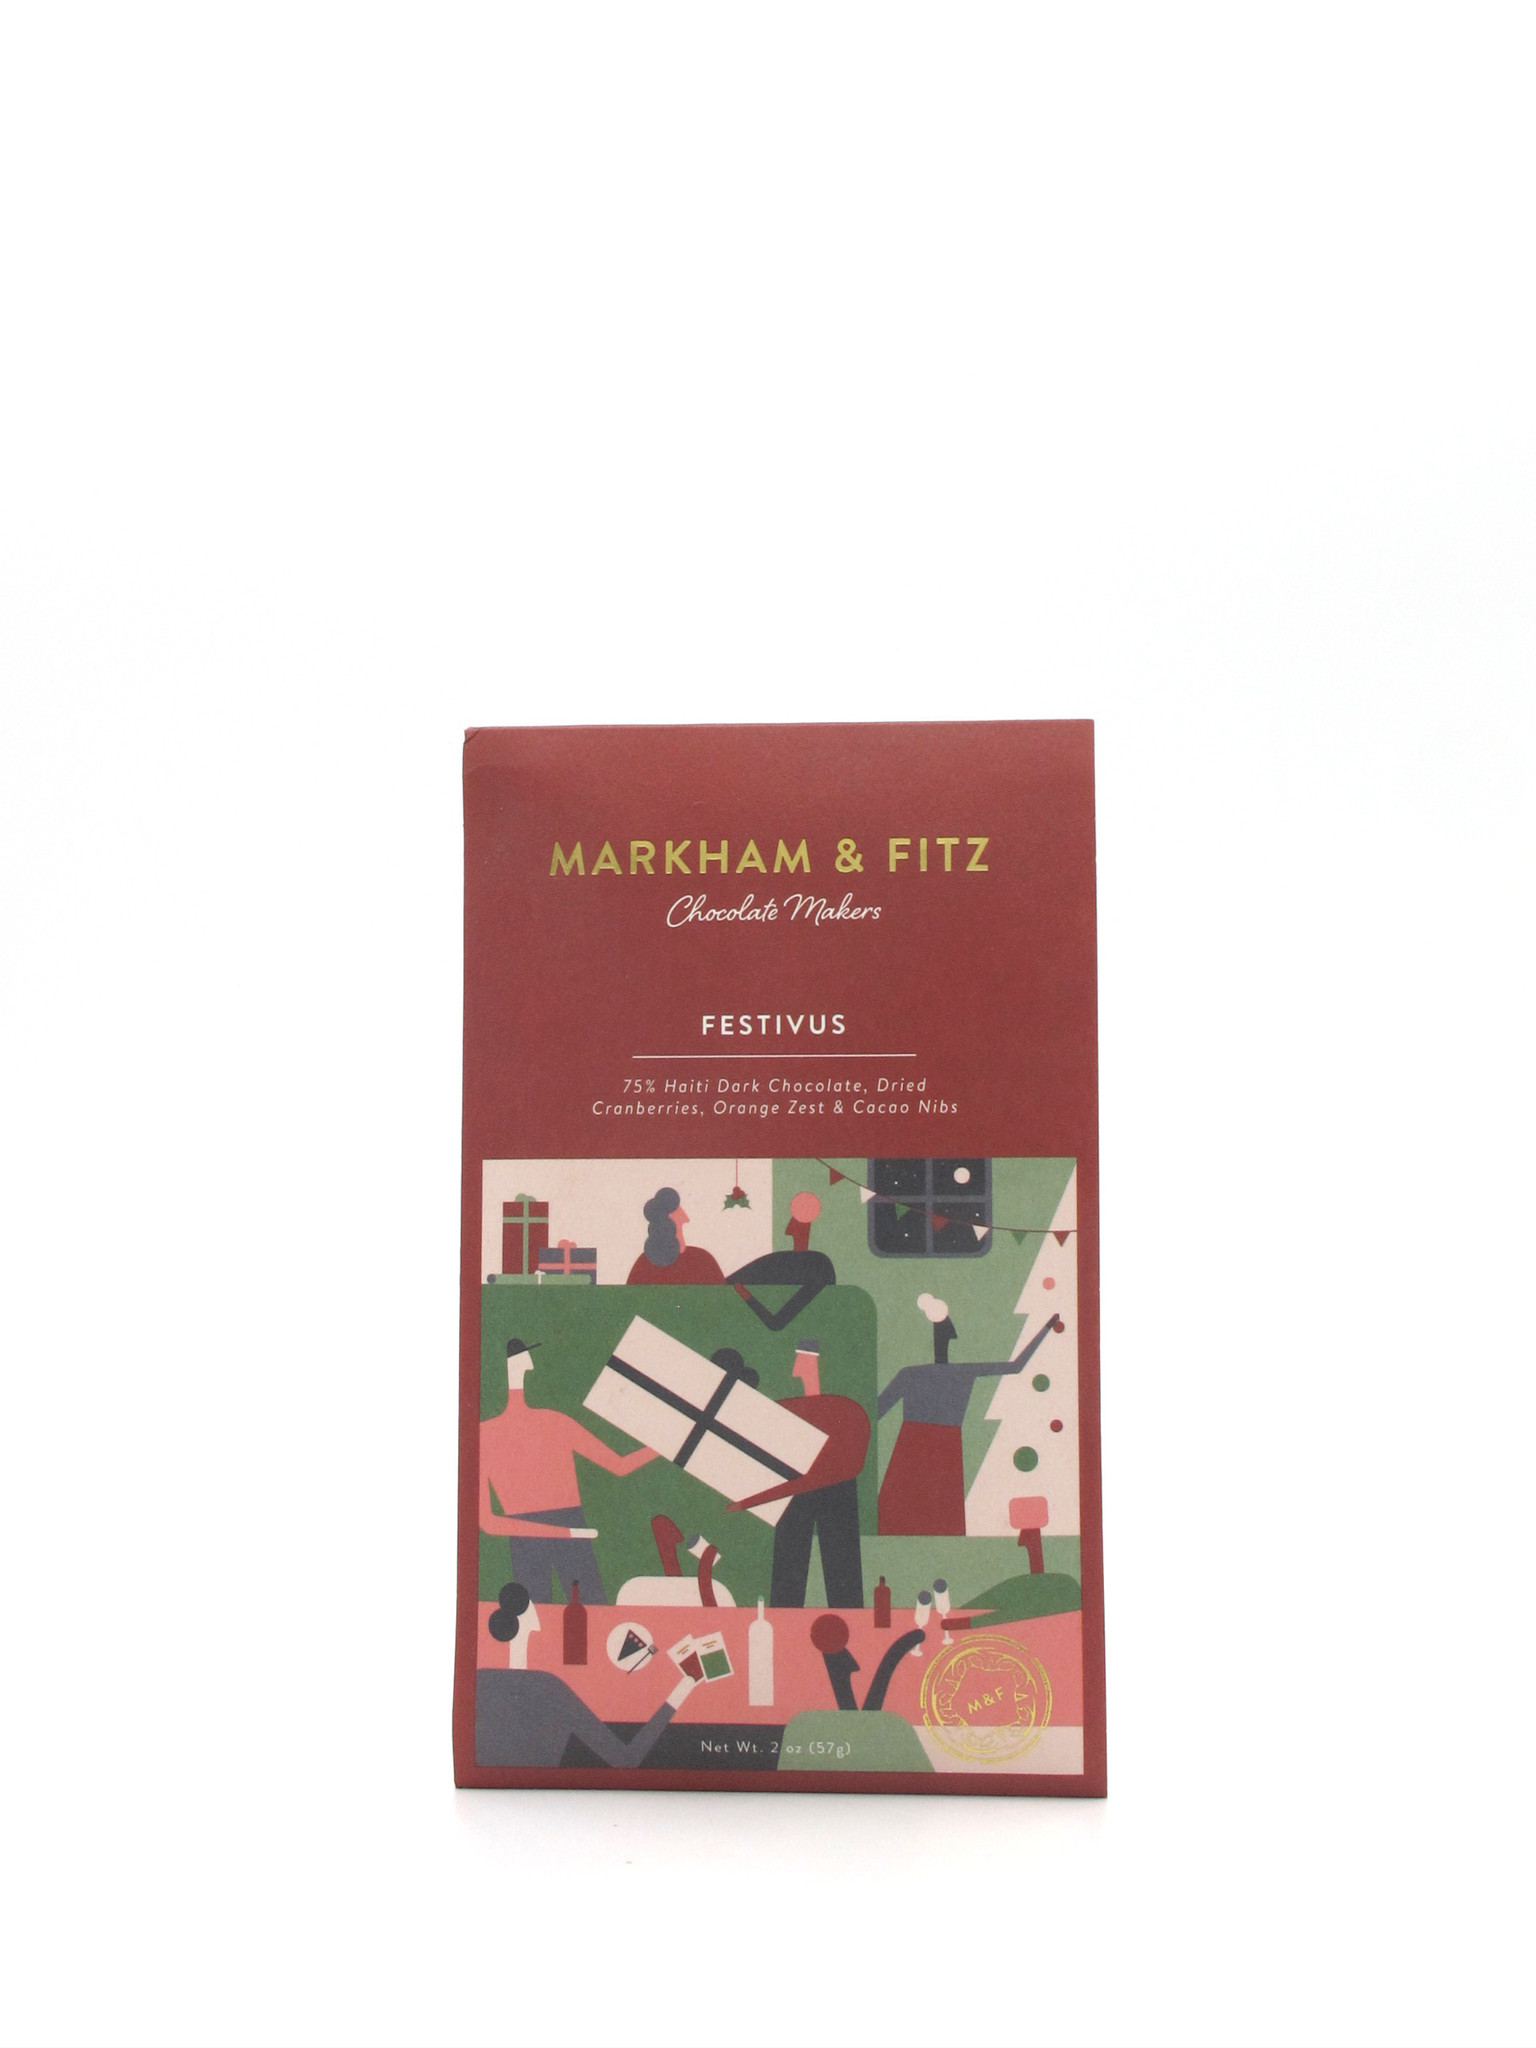 Markham & Fitz Chocolate Makers Markham & Fitz Chocolate Makers Festivus Bar 75% 2oz